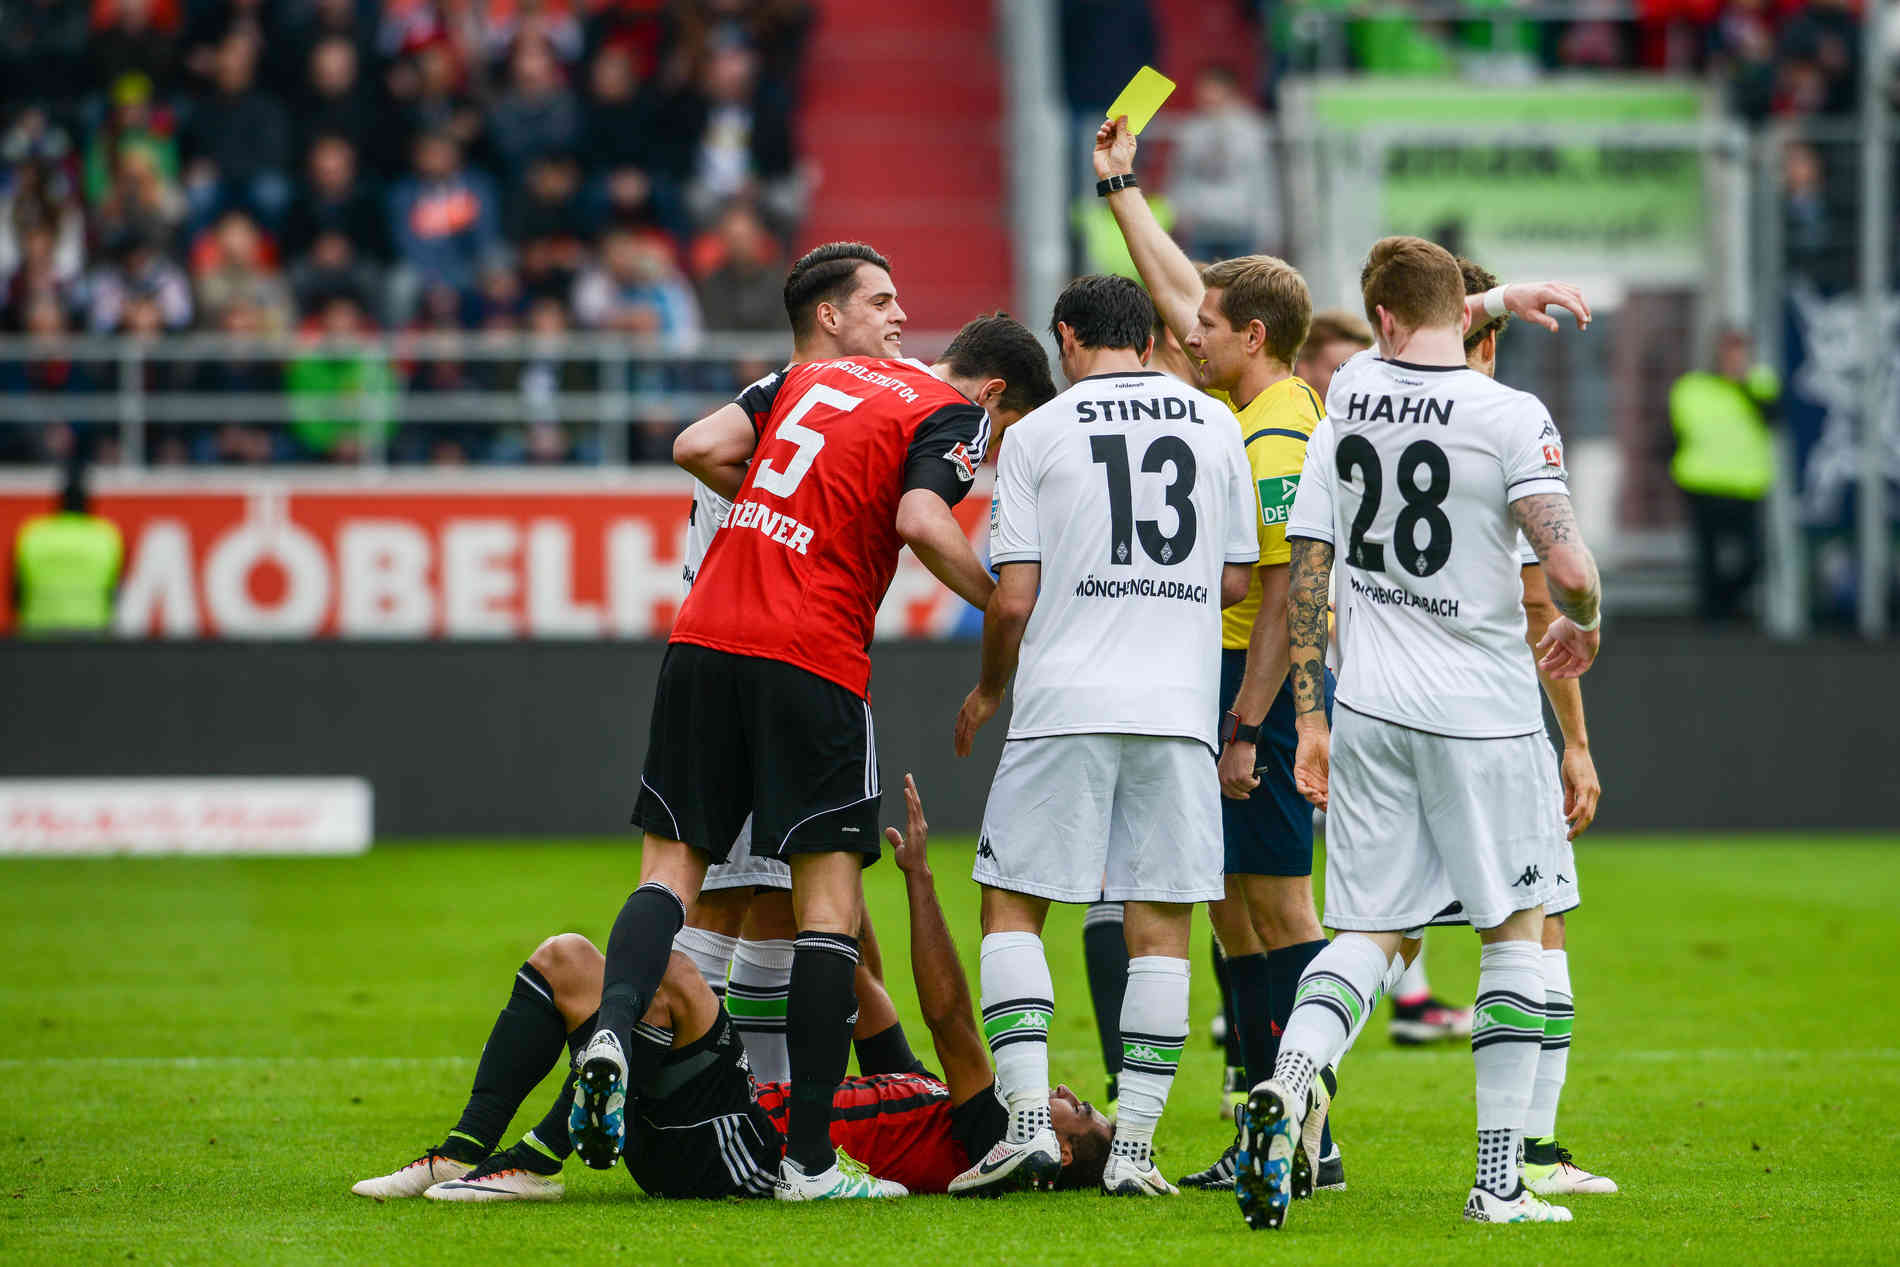 Borussia Mönchengladbach Ingolstadt